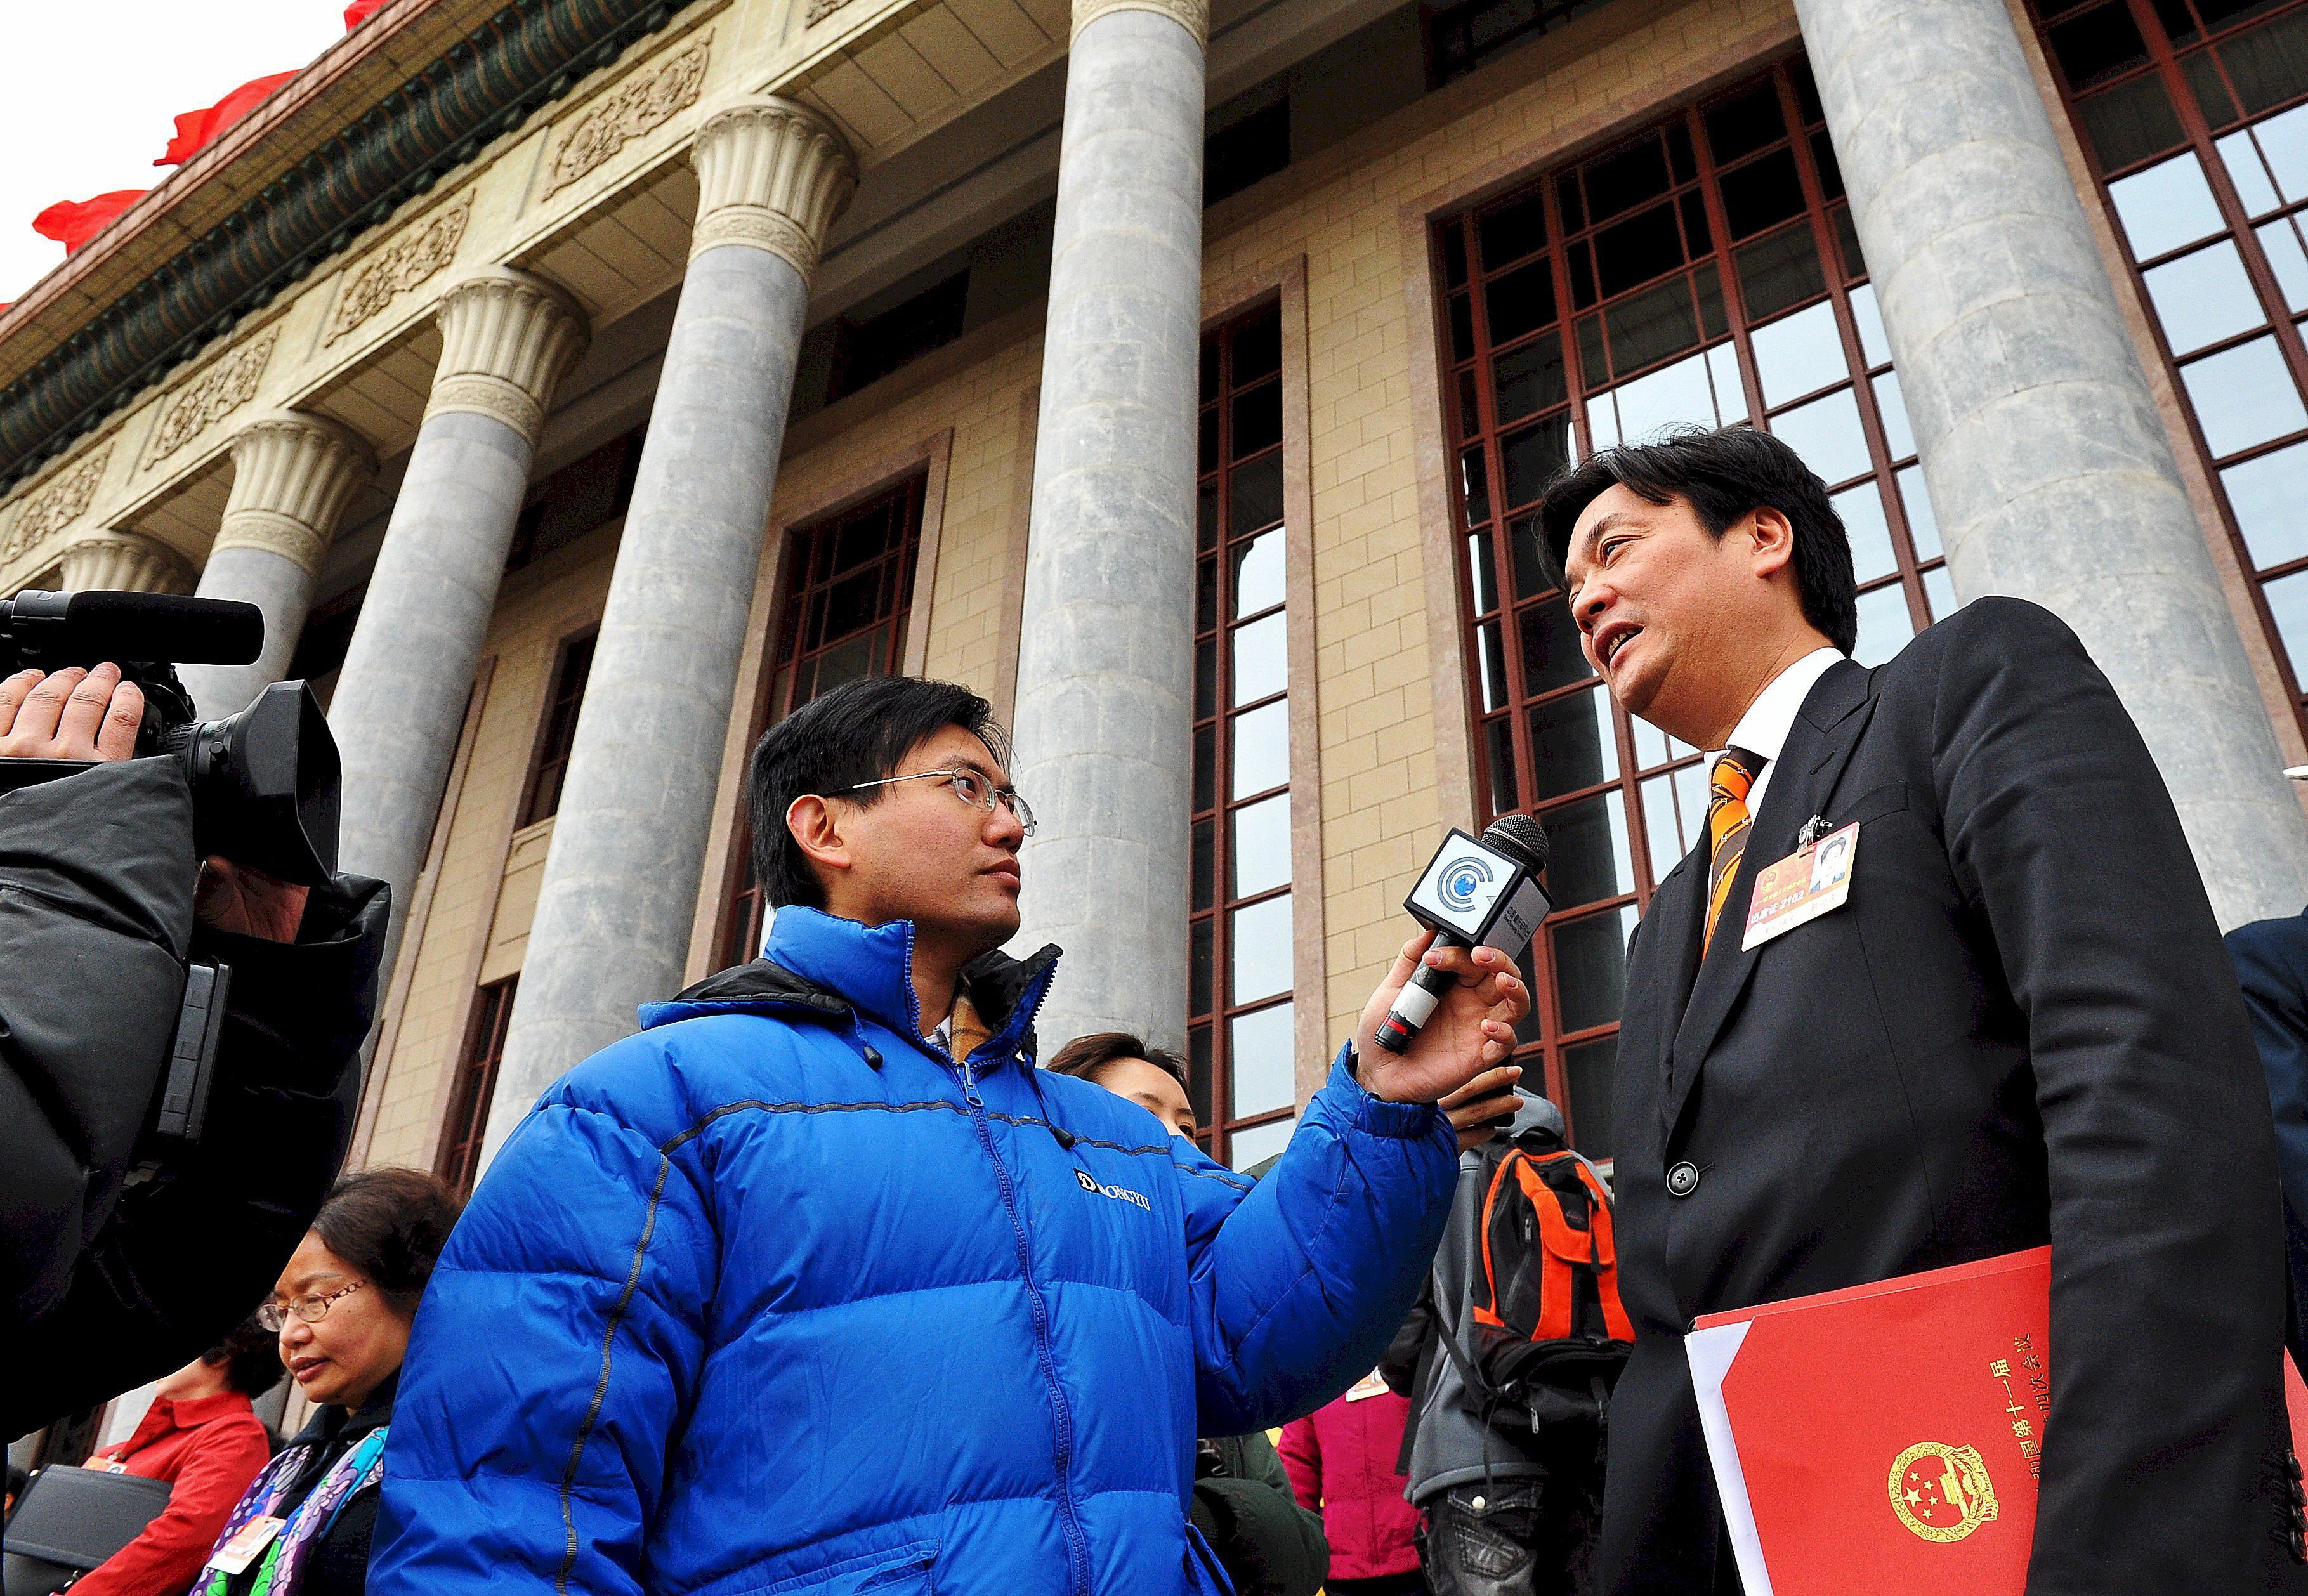 Journalists in Tiananmen Square